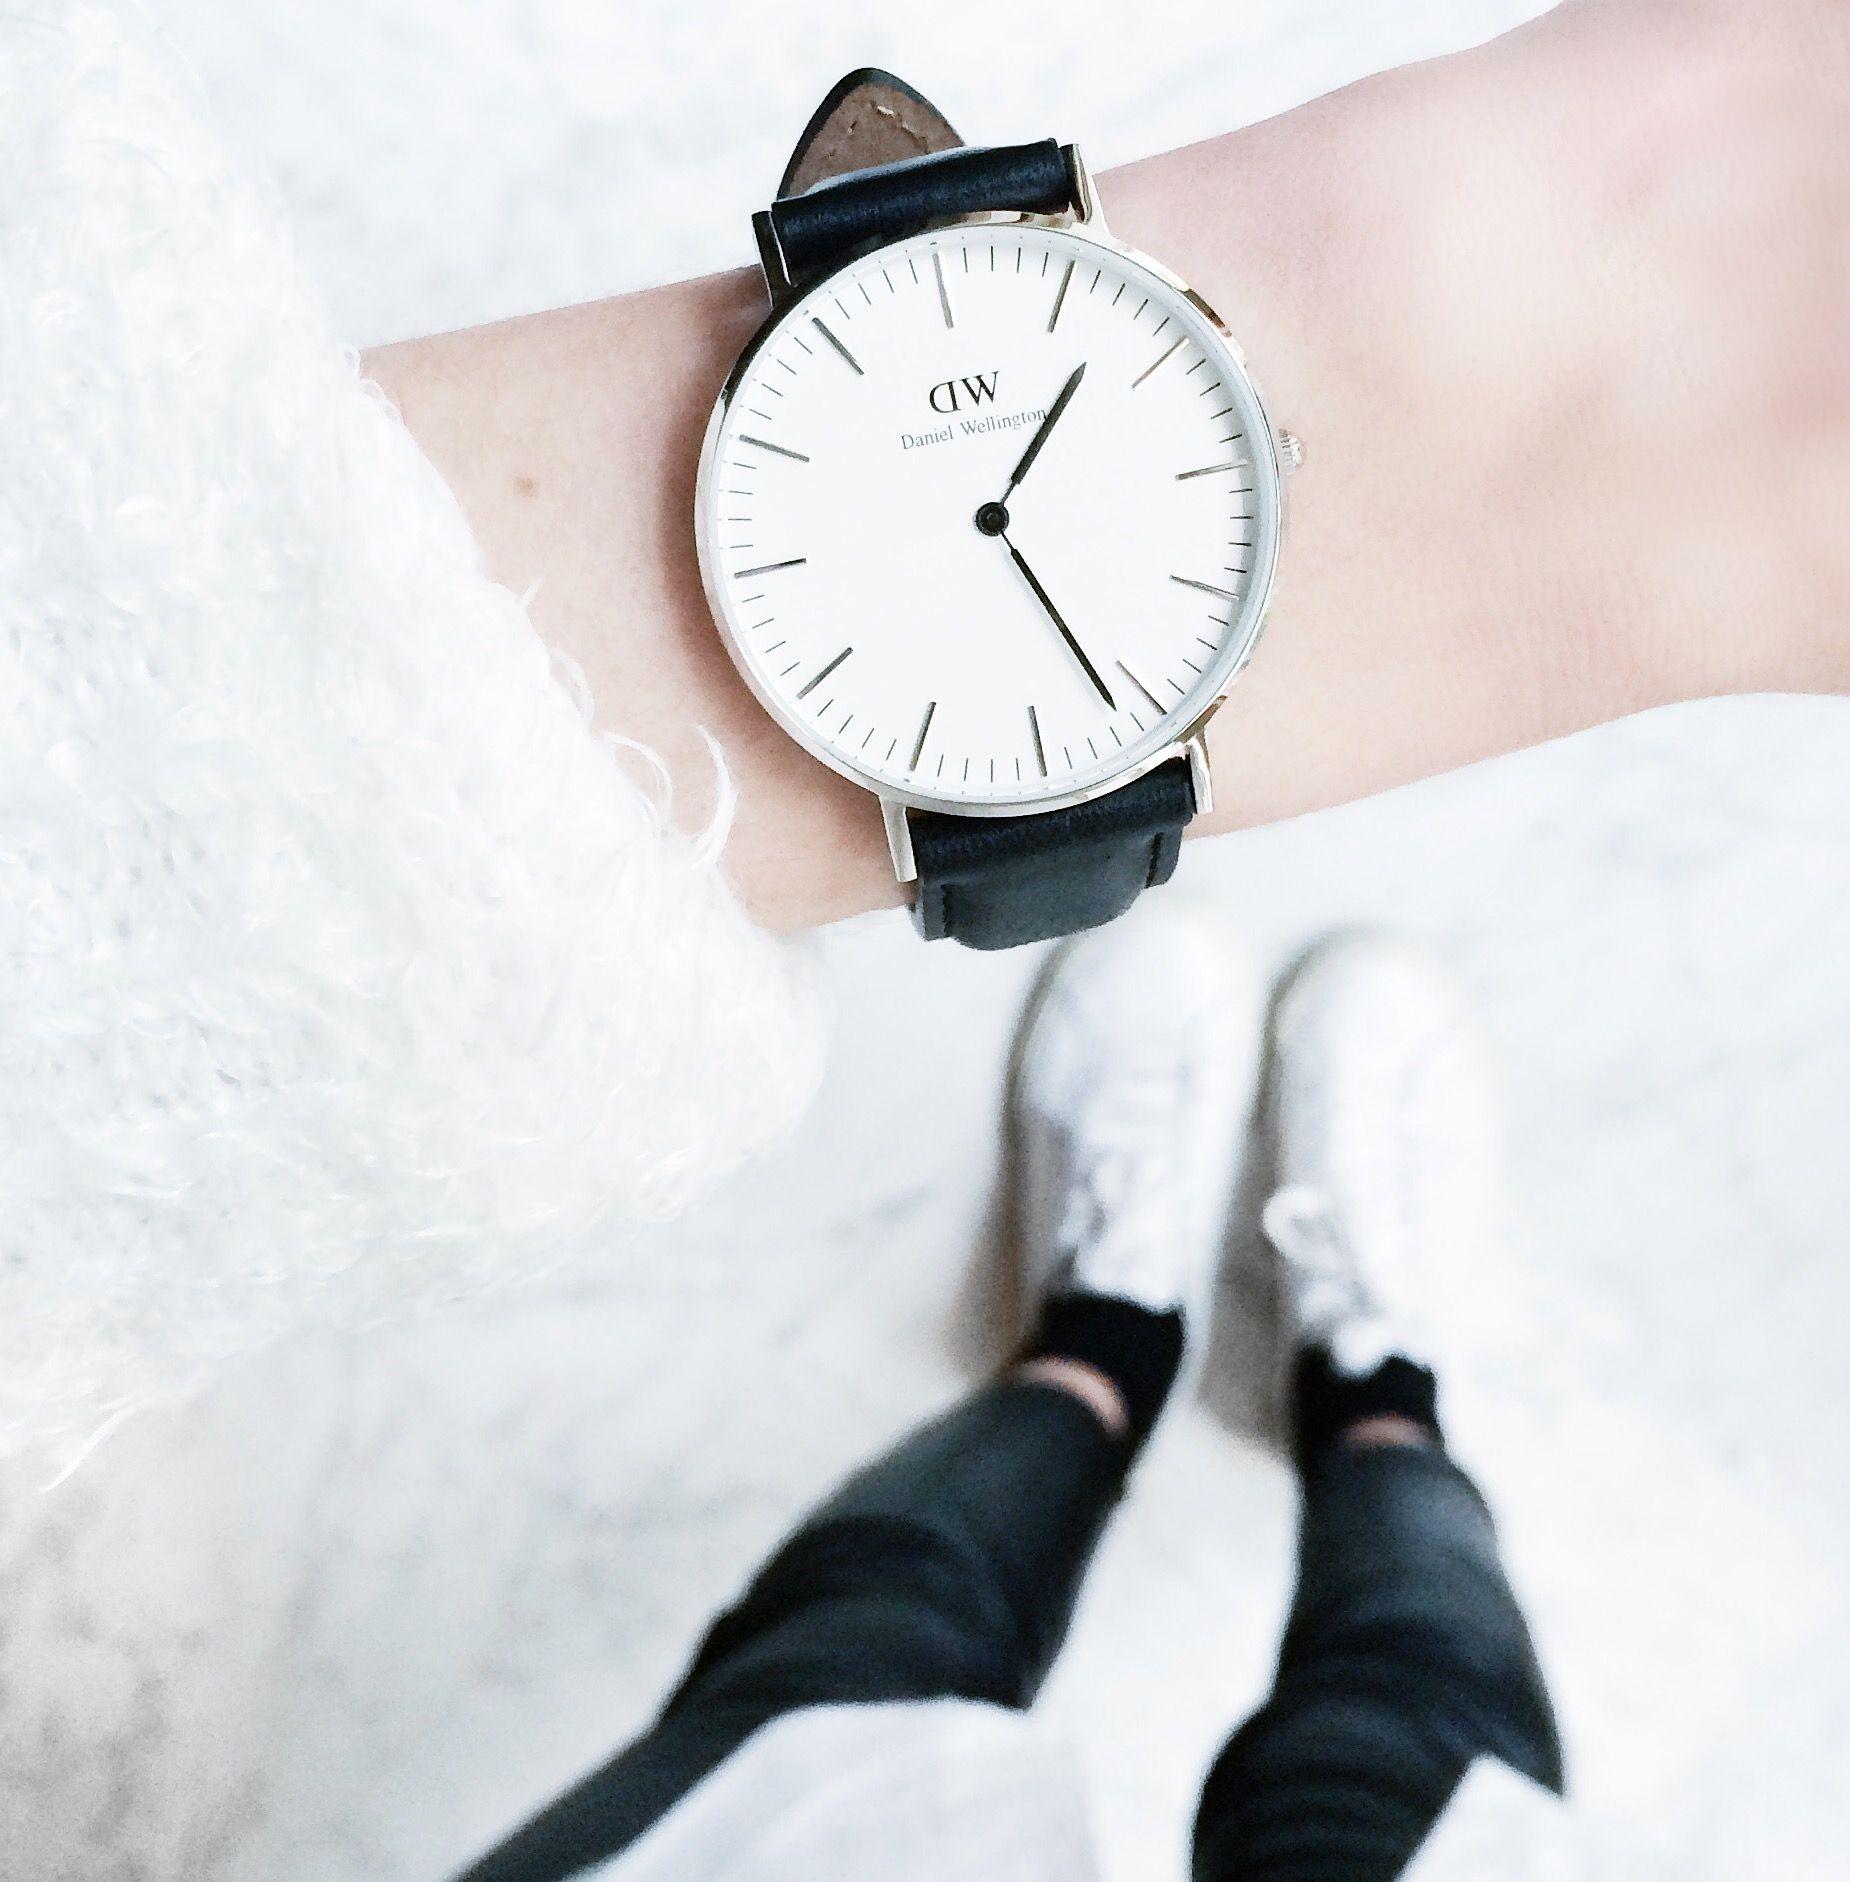 79f044353e1 MINIMAL + CLASSIC  daniel wellington watch - leia sfez